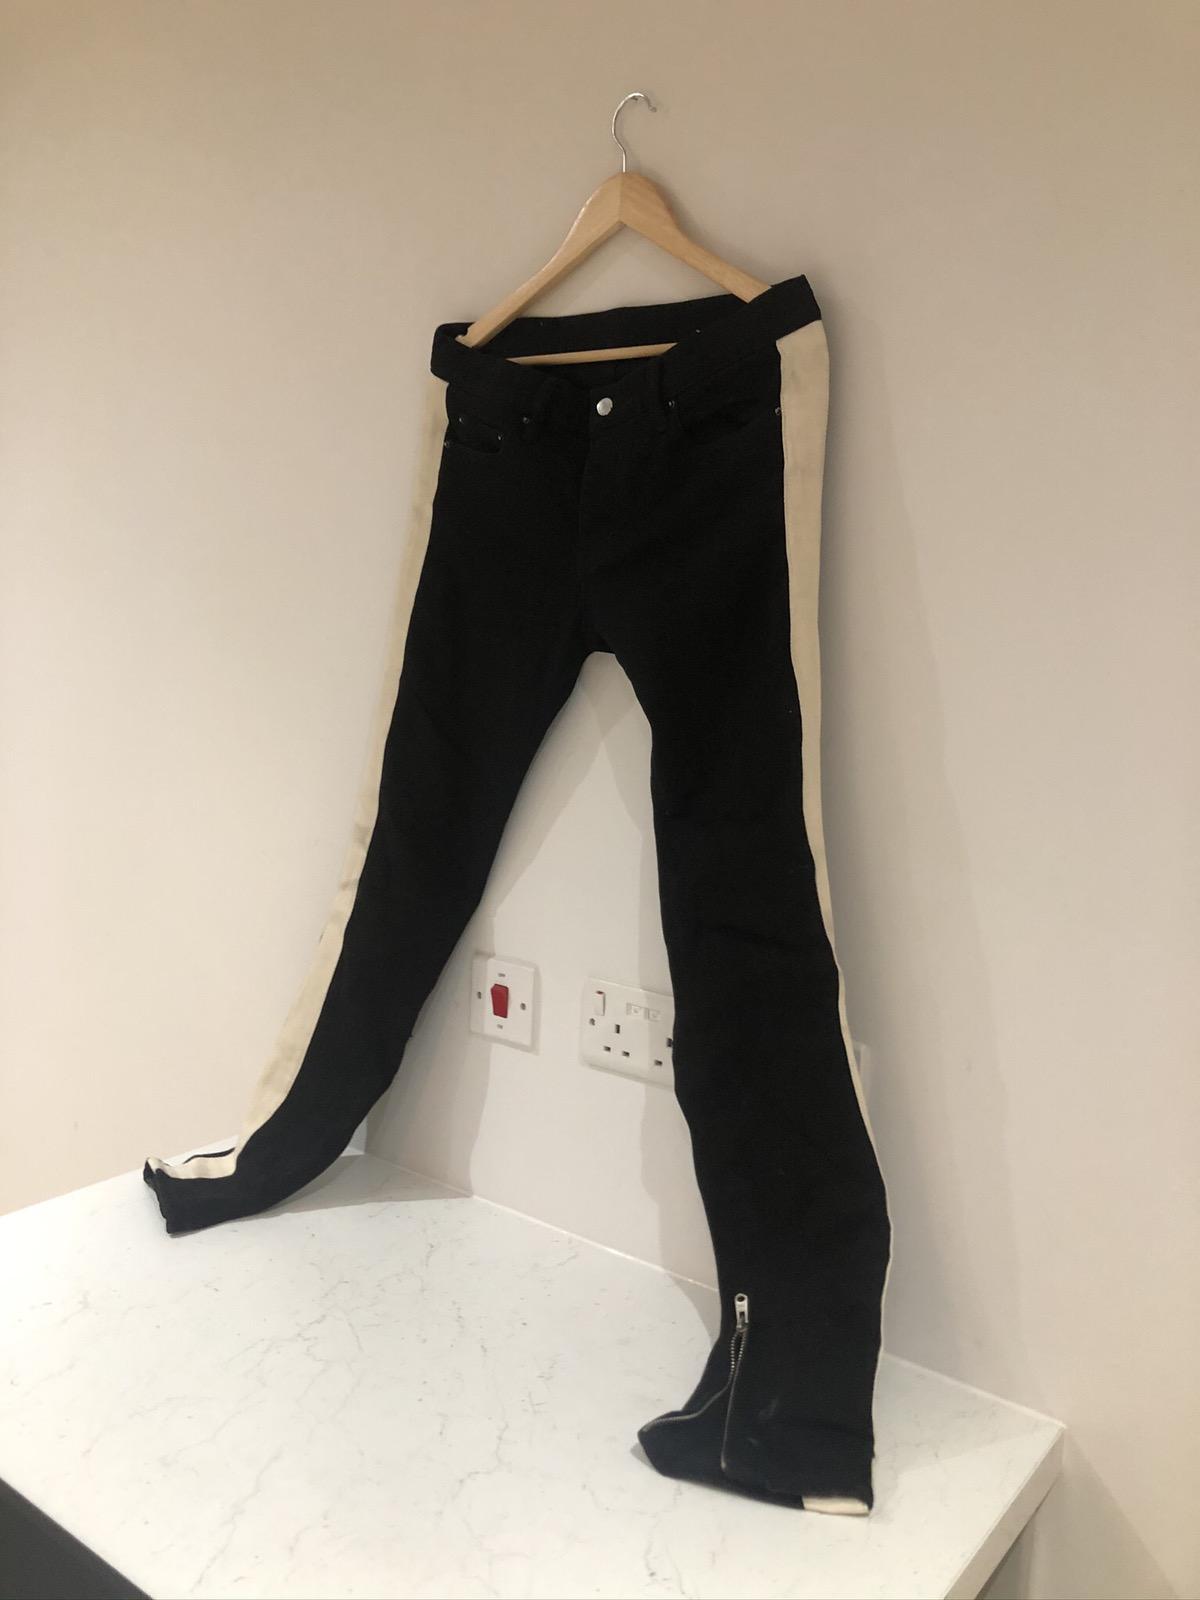 MNML Jeans Black Size 31 w/stripe and zip